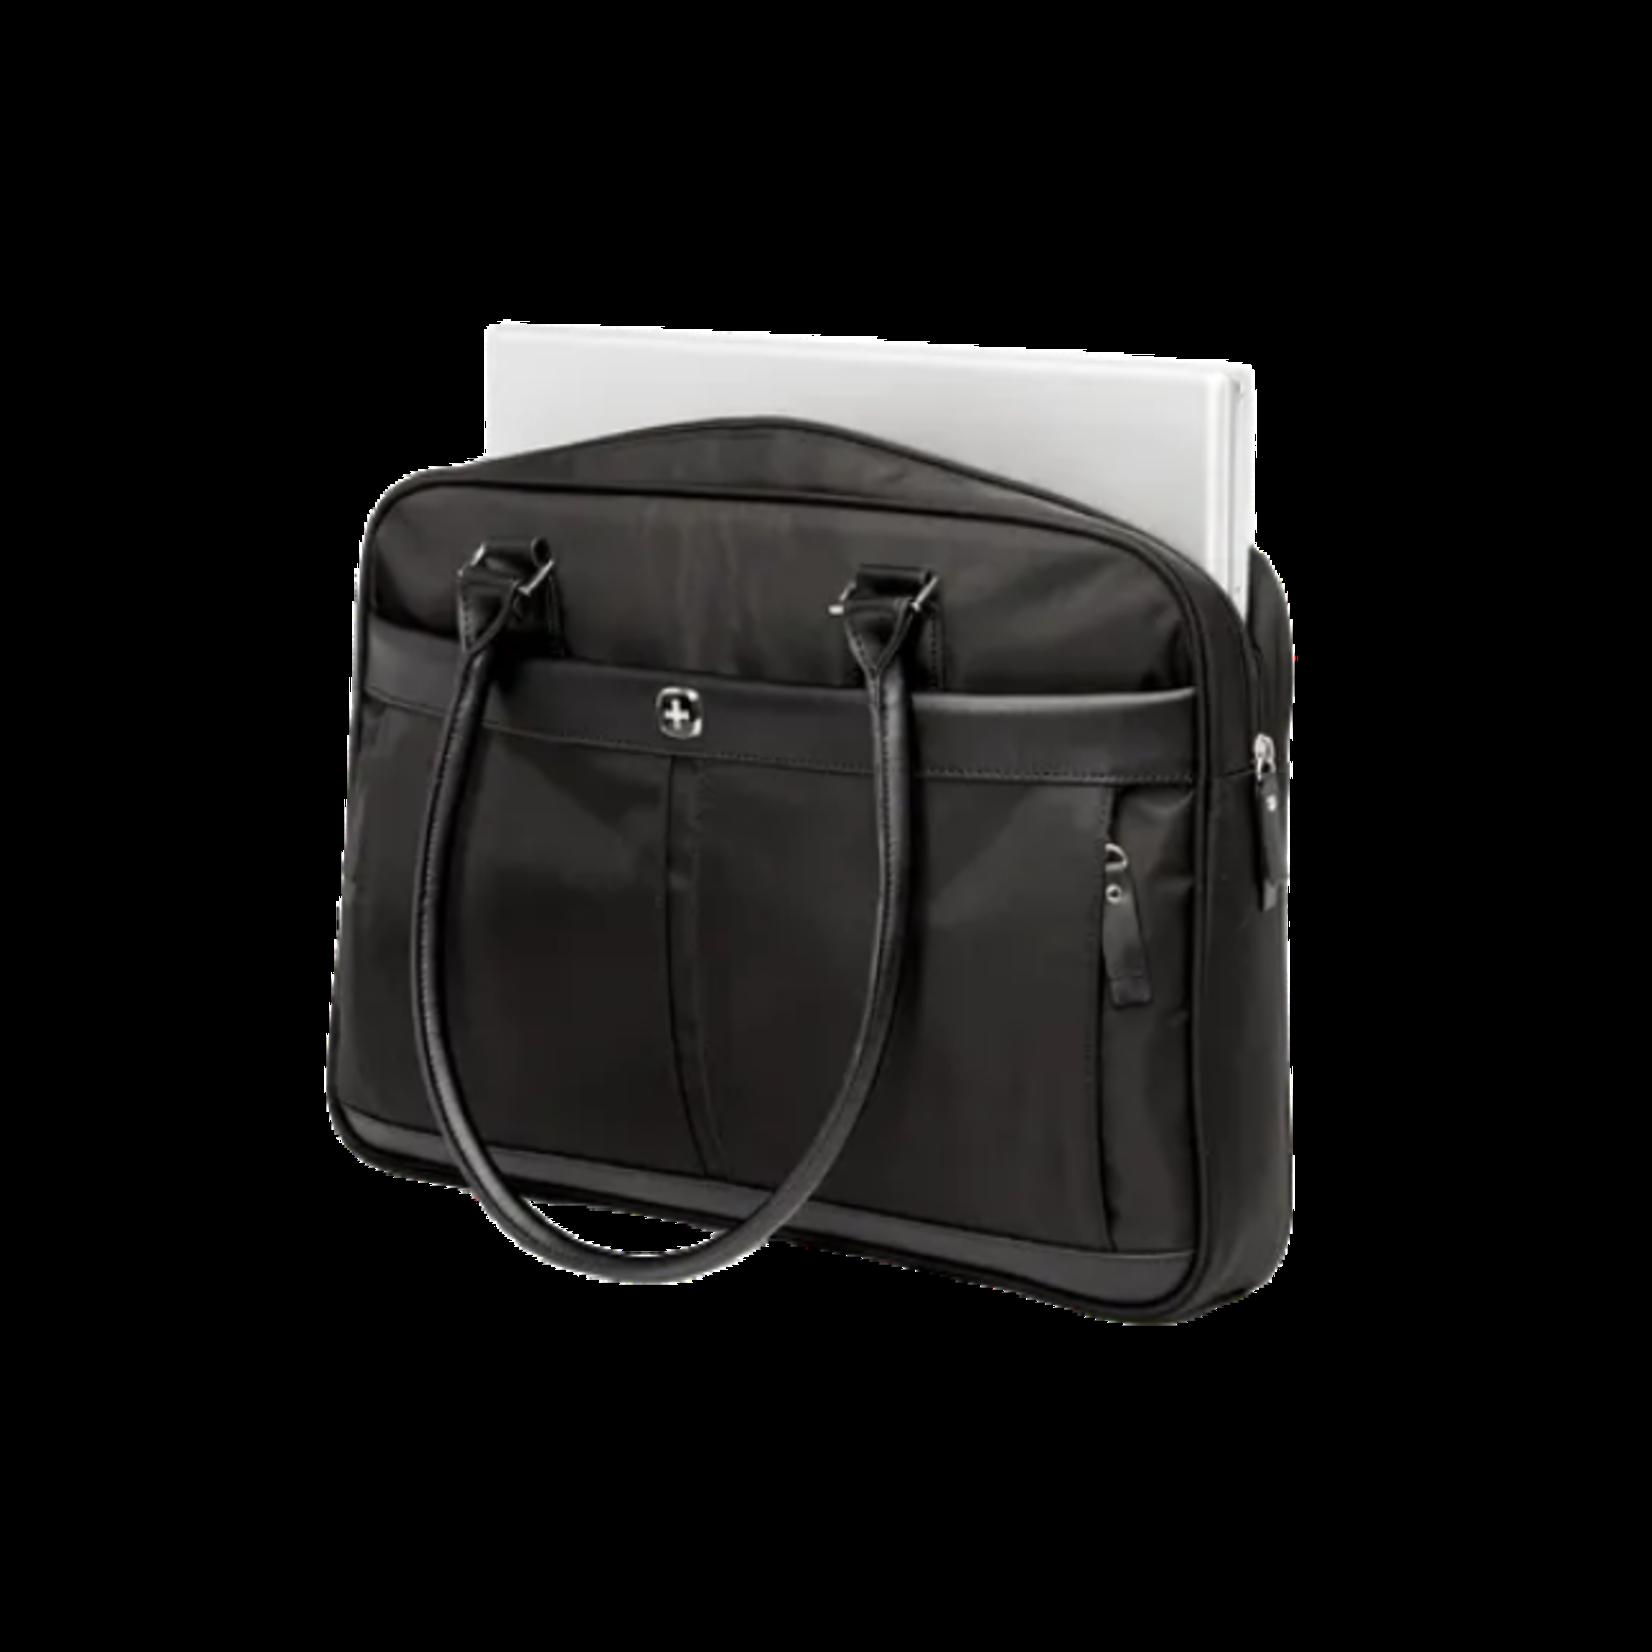 SWISS GEAR 15.6 LAPTOP BAG